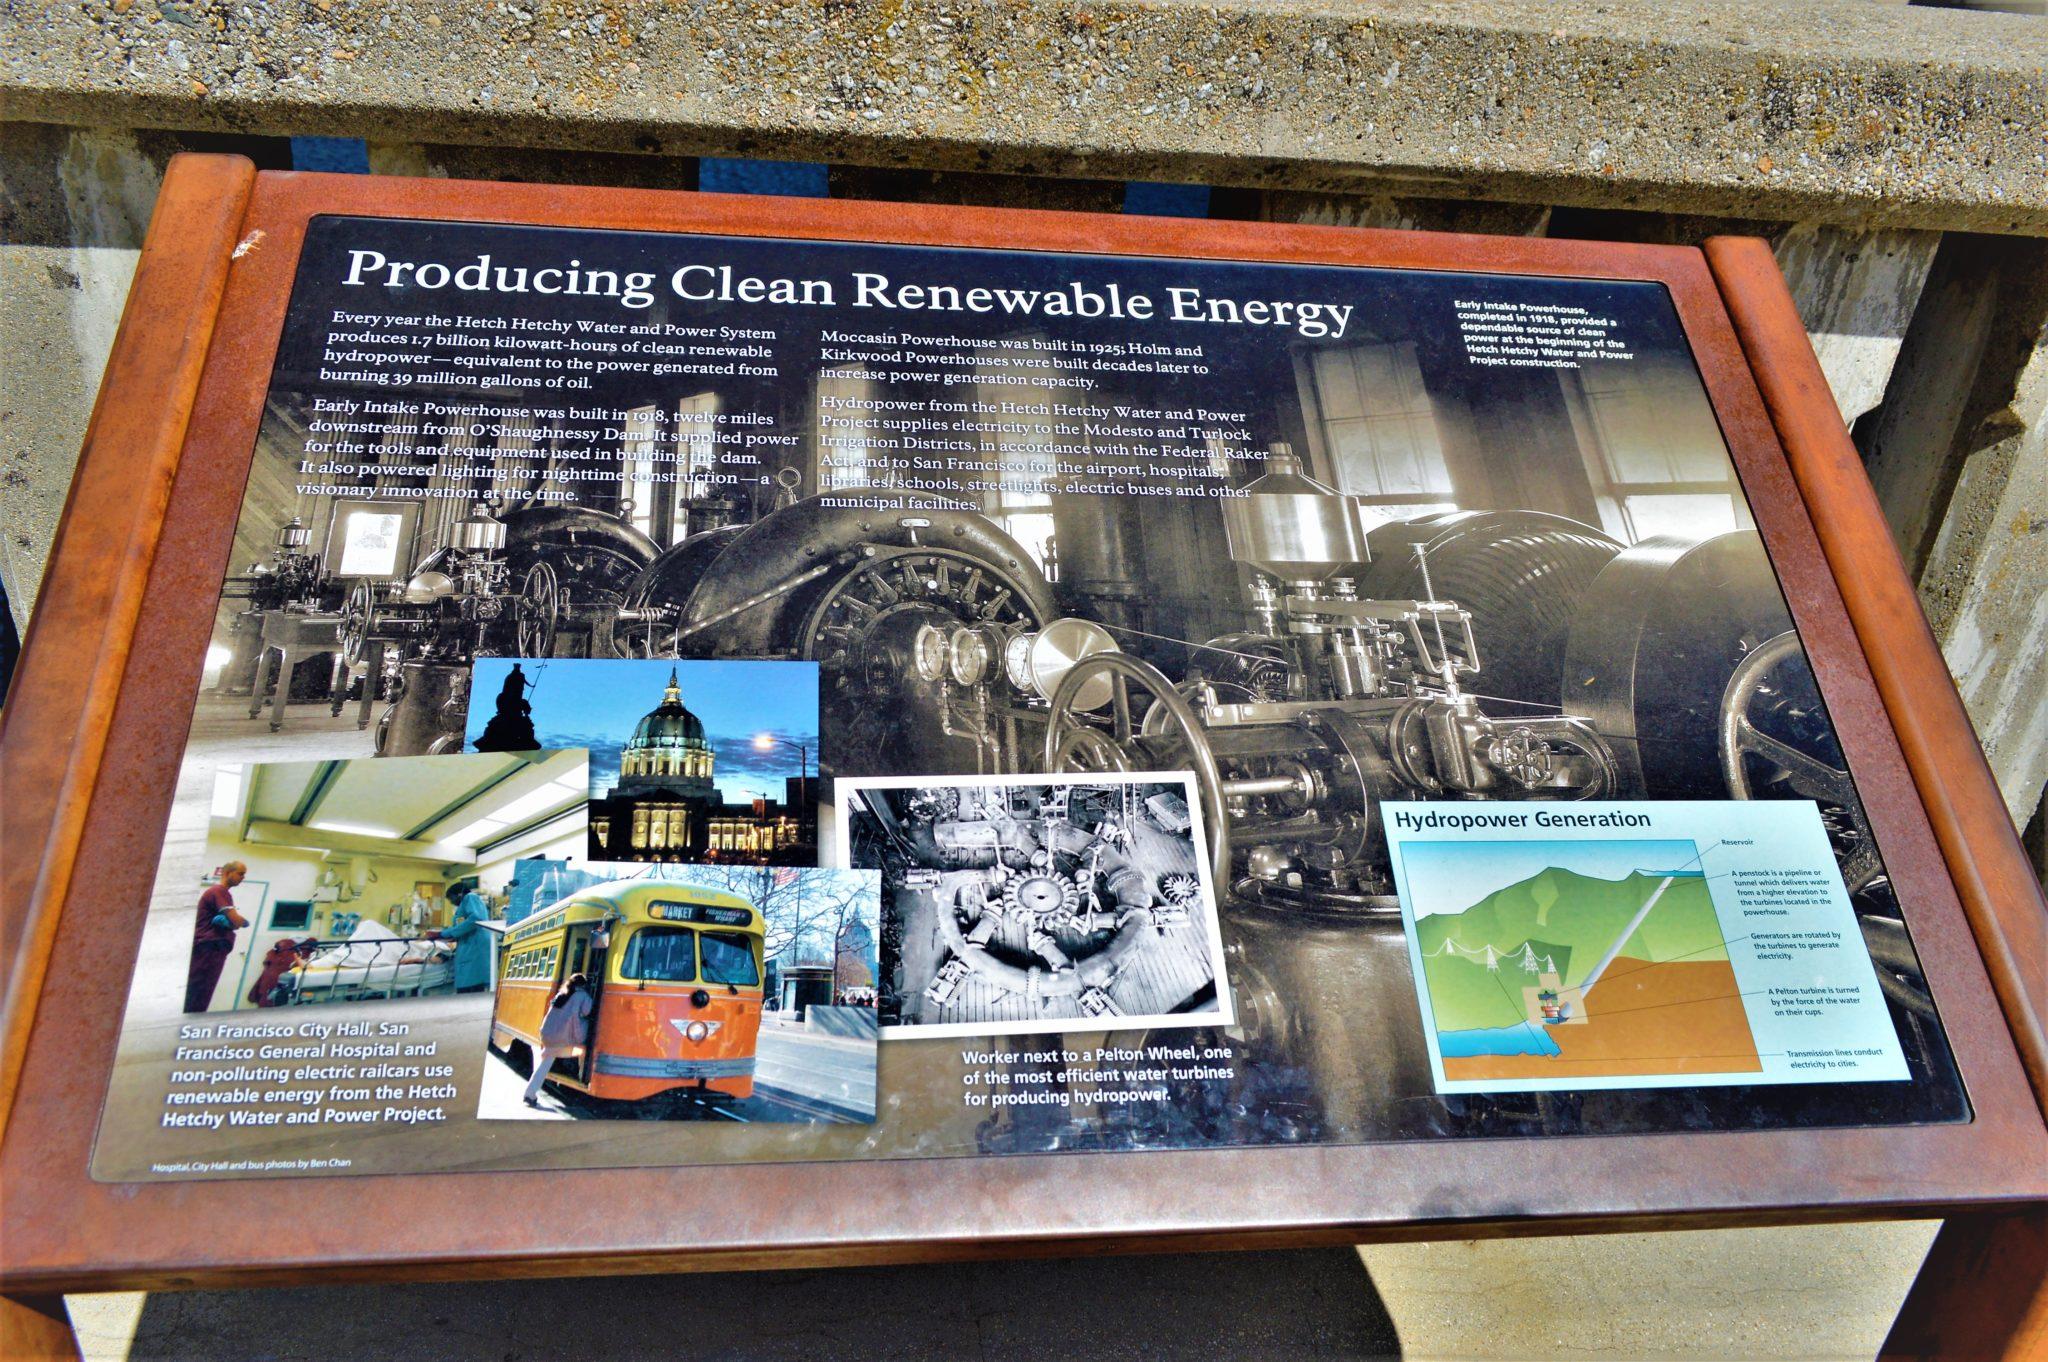 Clean renewable energy, Hetch Hetchy, California